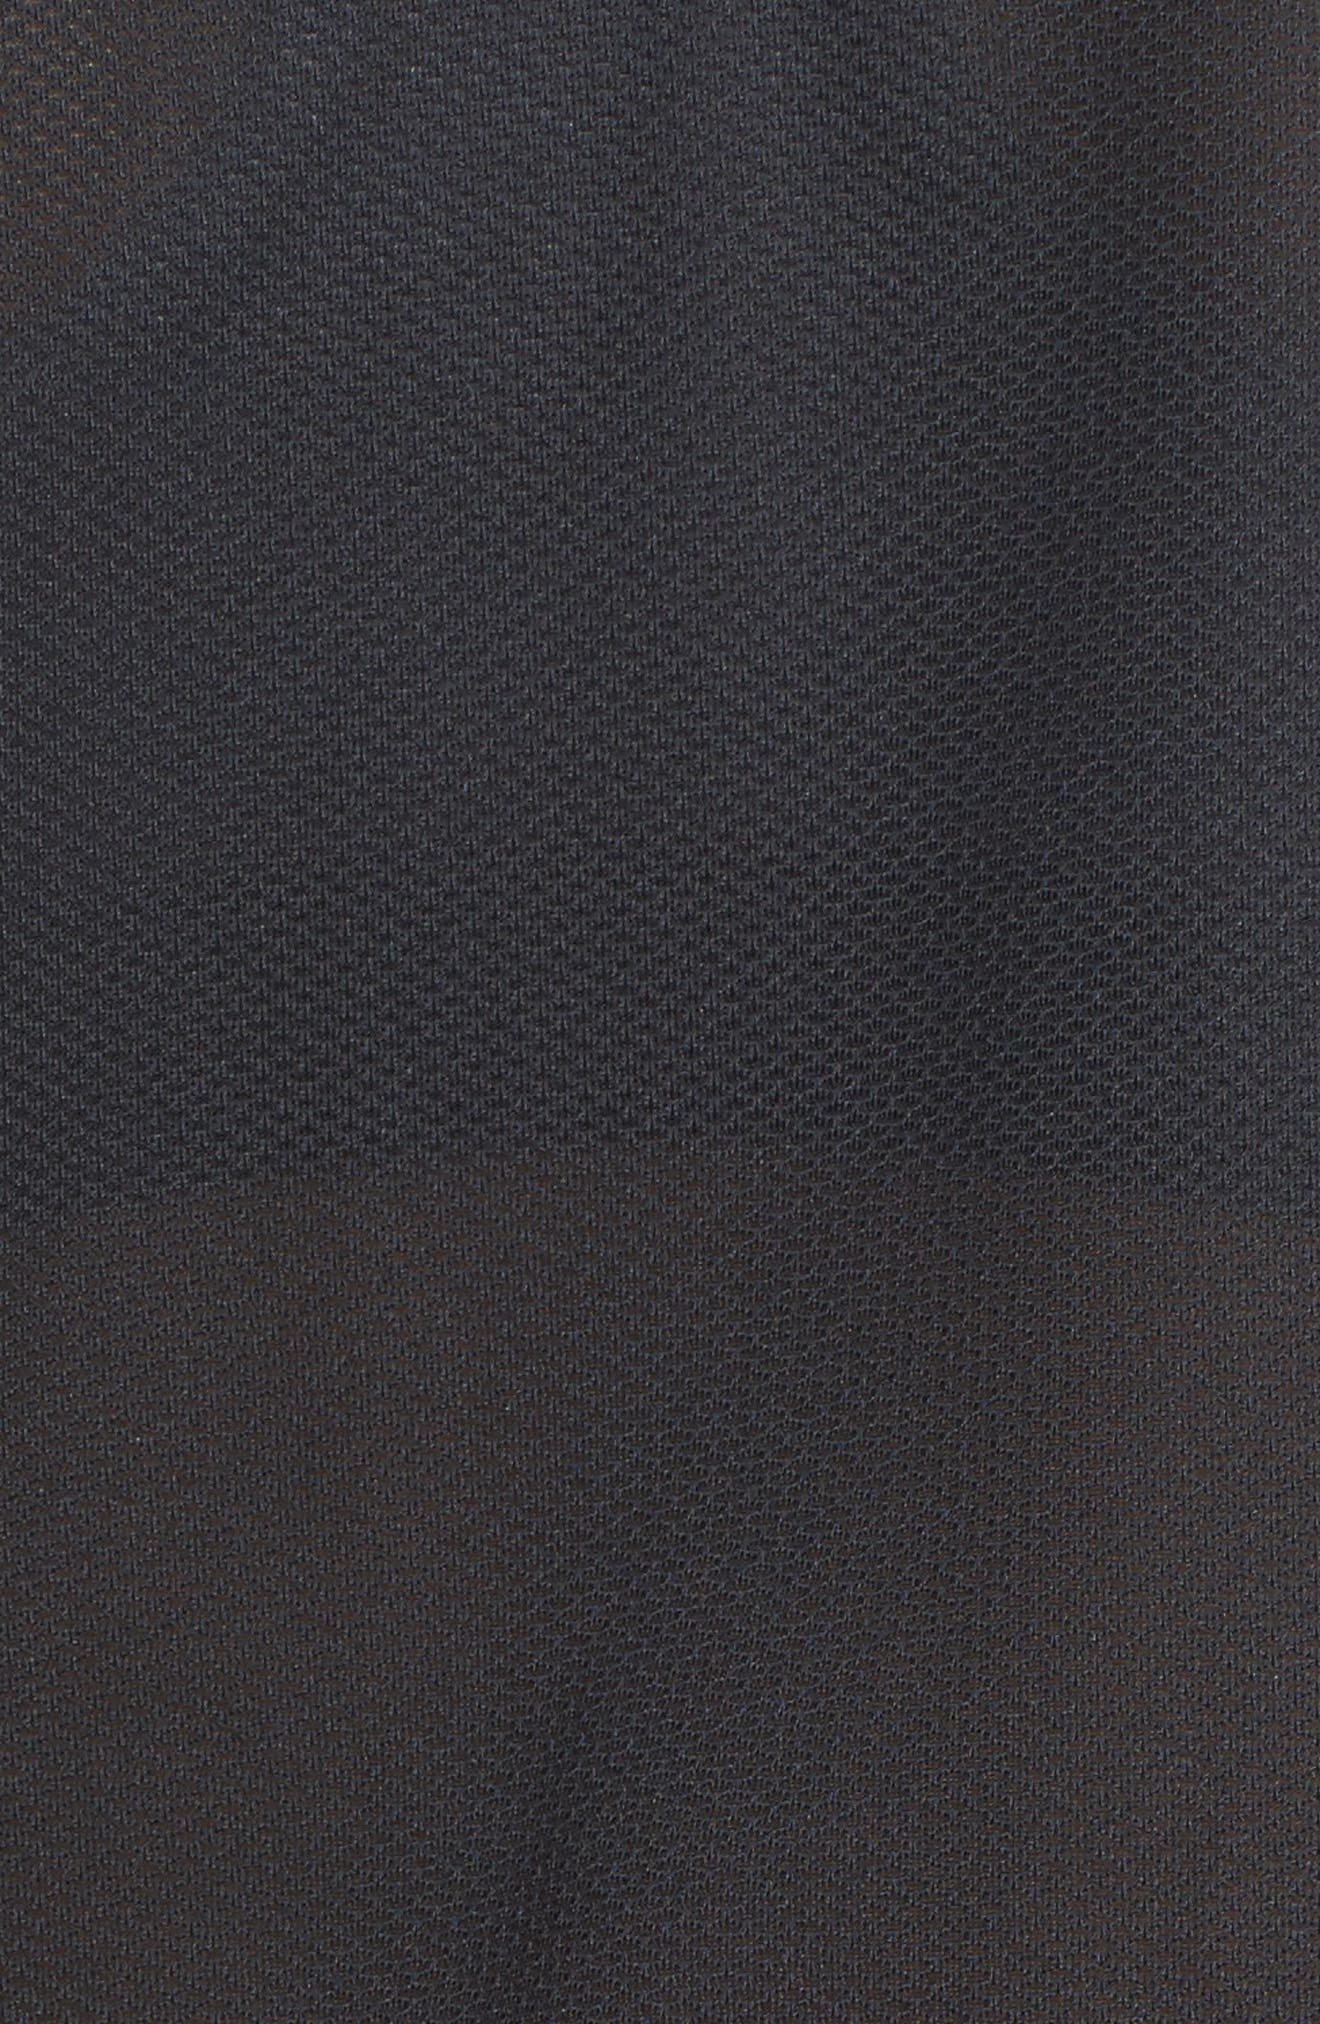 Flex Dri-FIT Training Jacket,                             Alternate thumbnail 5, color,                             010